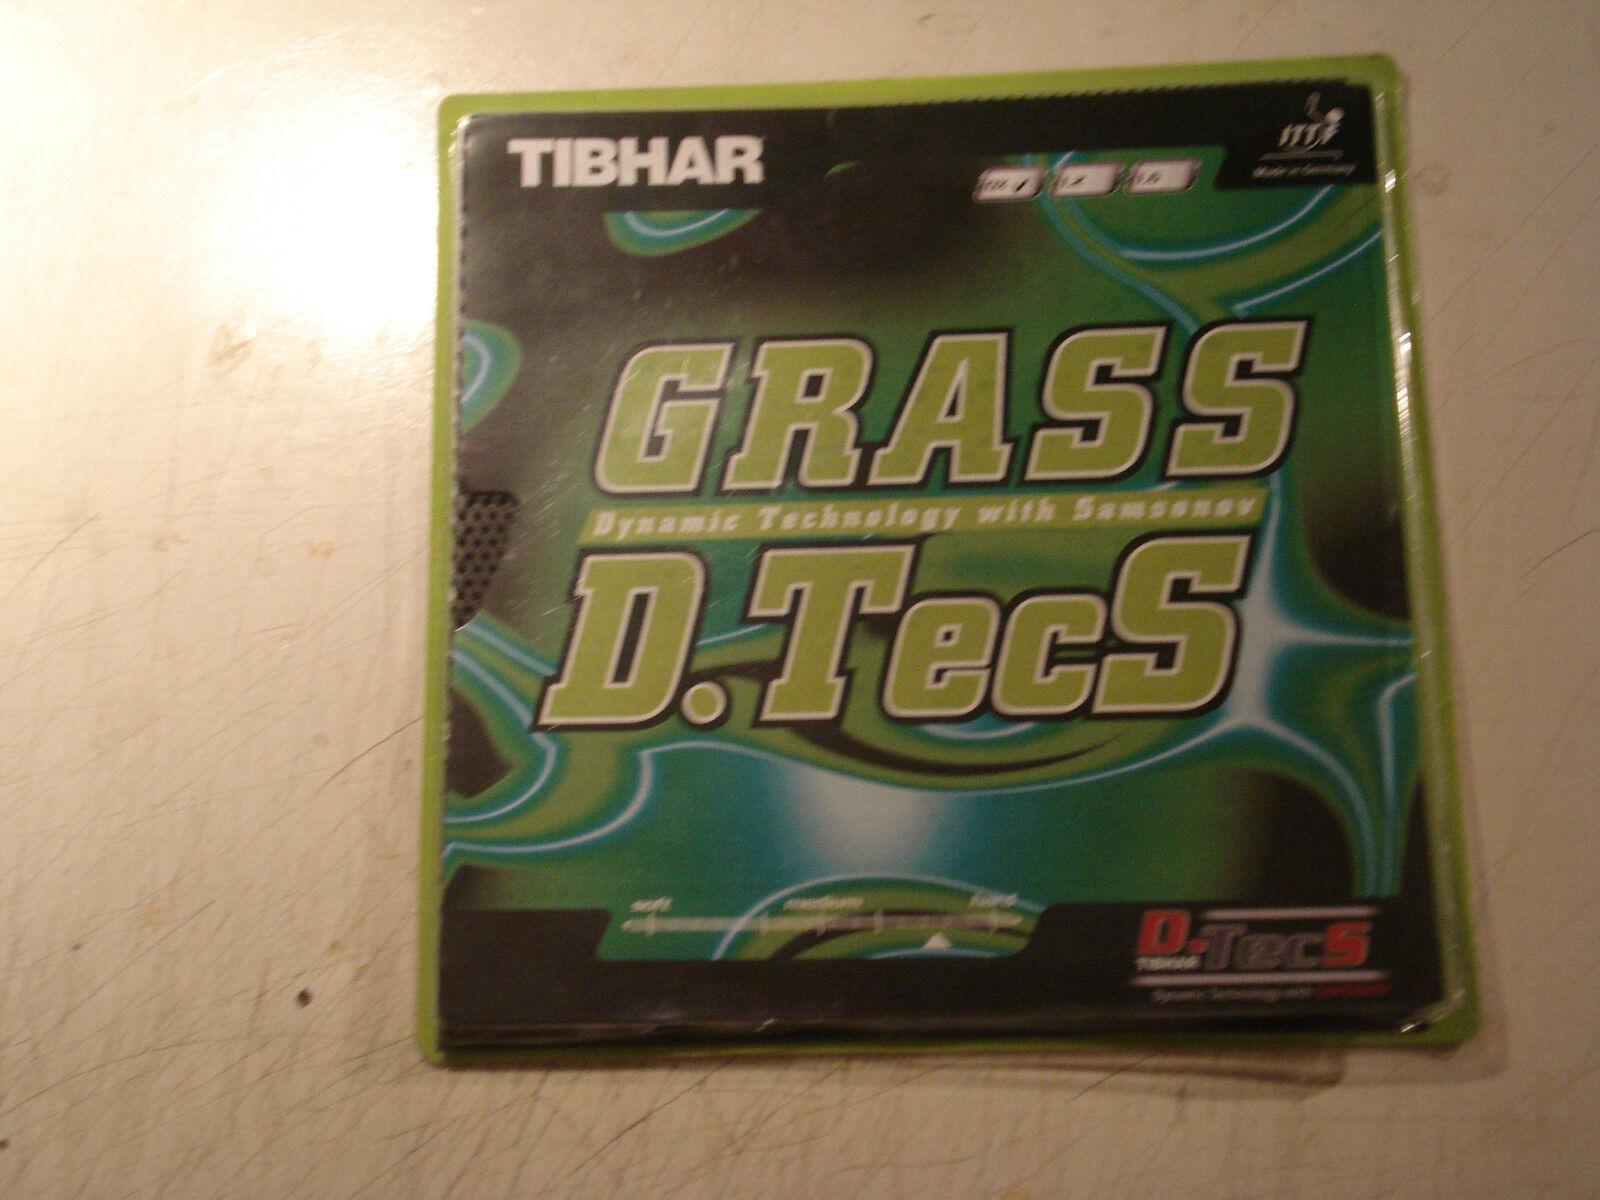 Tibhar Grass D.TecS Spezialbehandelt glatt glatt glatt und sehr langsam,OX,größte Störung c0d460